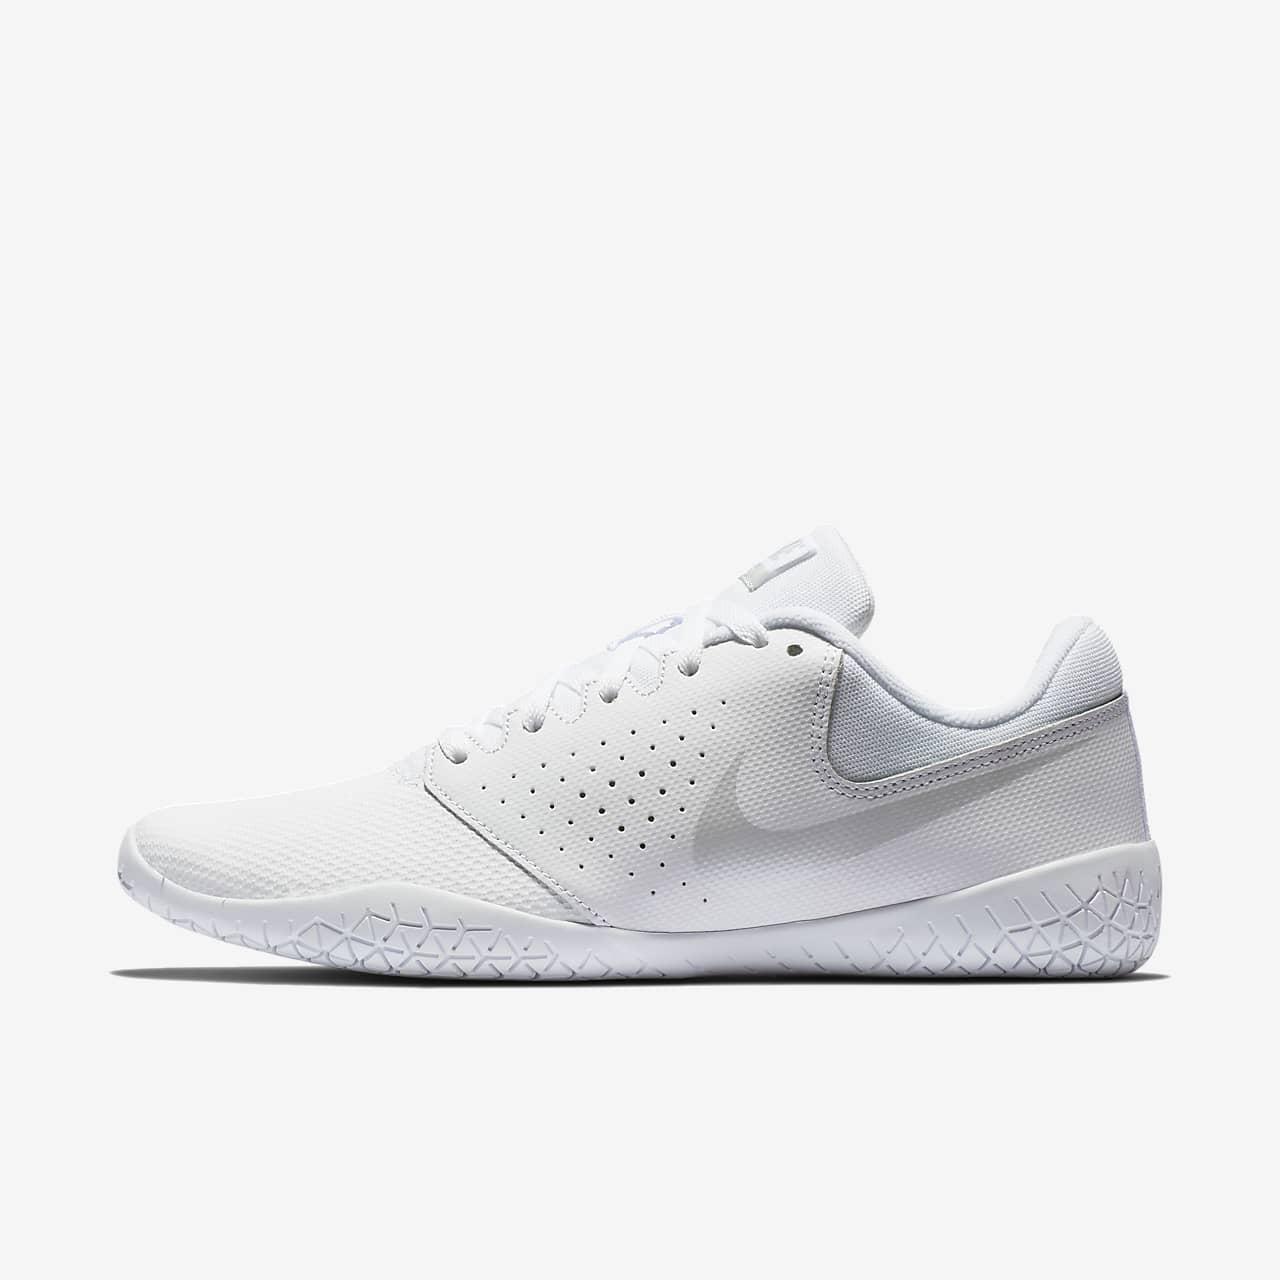 Nike Sideline IV Women's Cheerleading Shoe